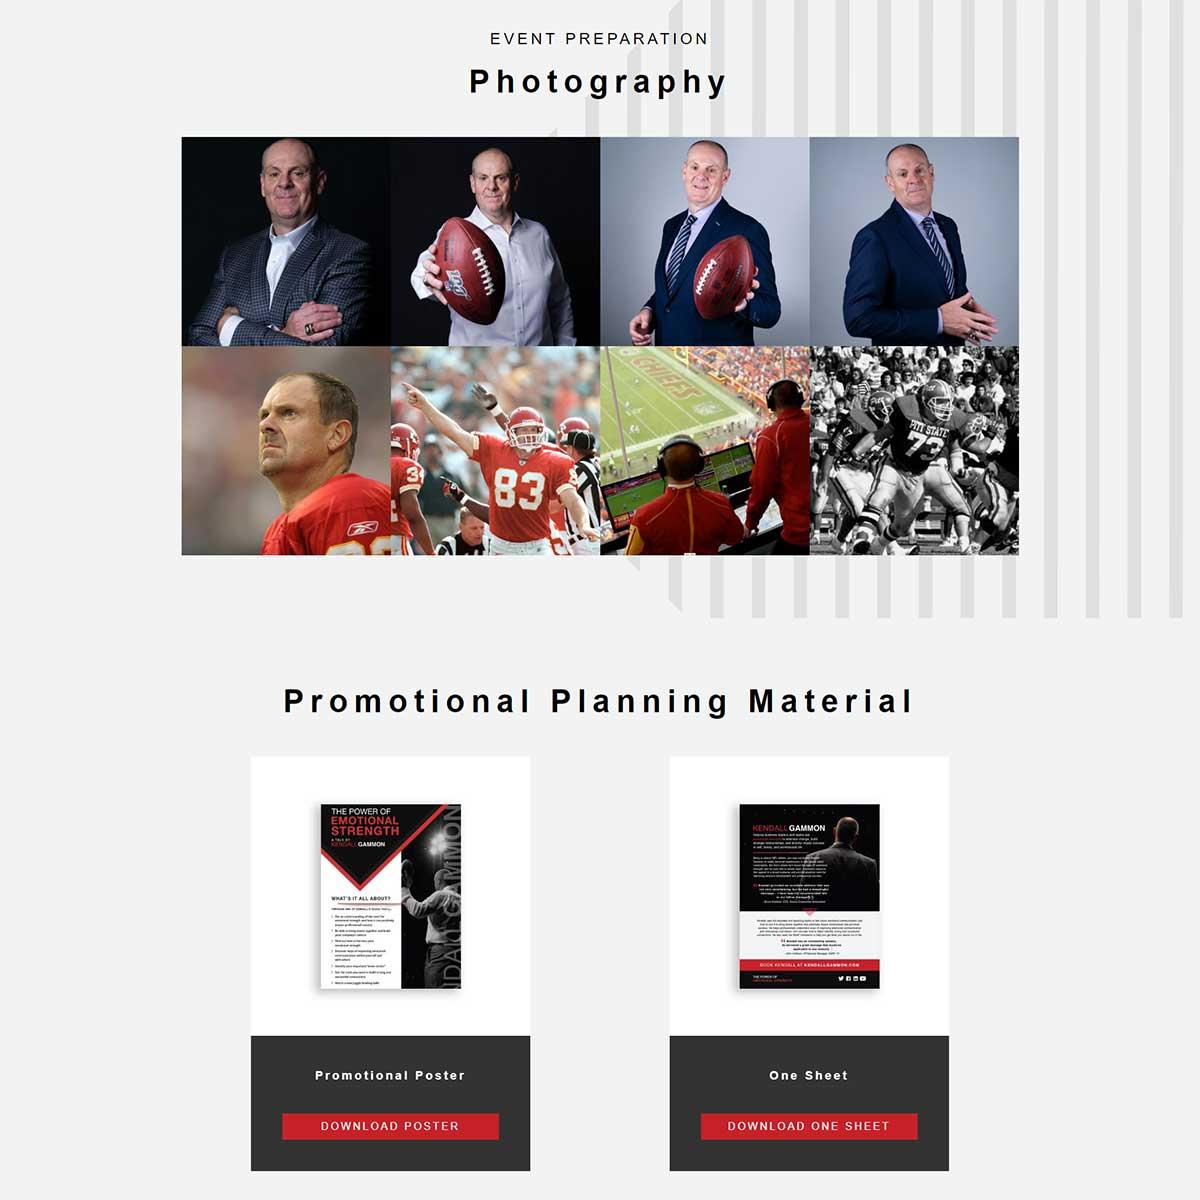 limelight marketing website design and development for kendall gammon